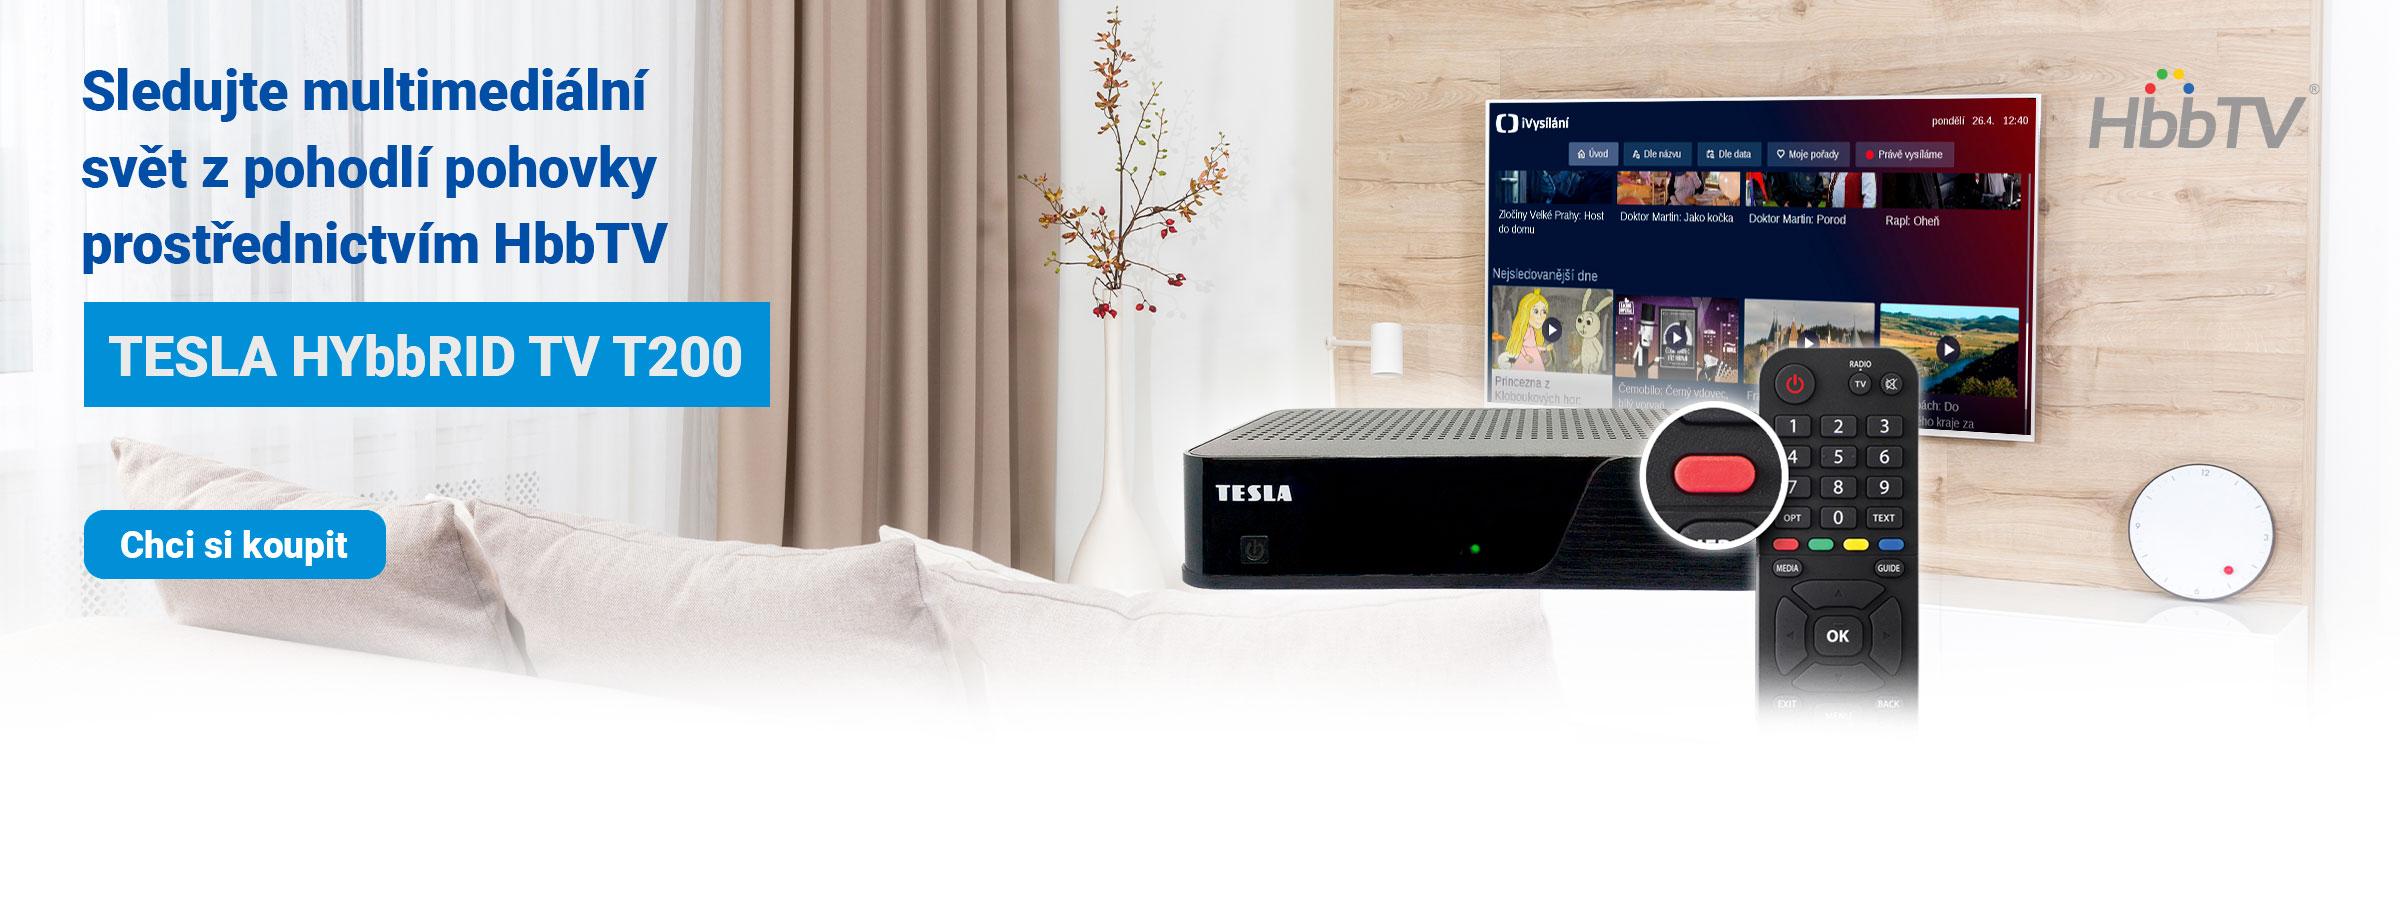 TESLA HYbbRID TV T200 - DVB‒T2 H.265 (HEVC) přijímač s HbbTV